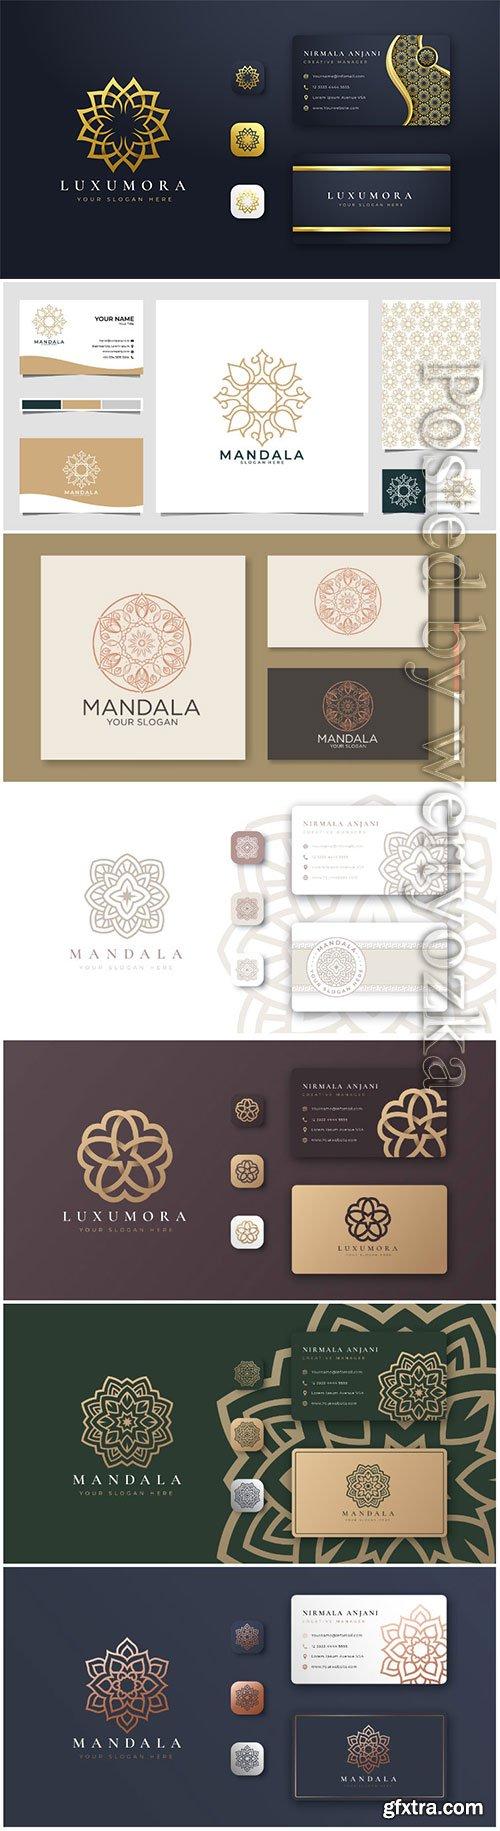 Golden mandala logo with business card premium vector